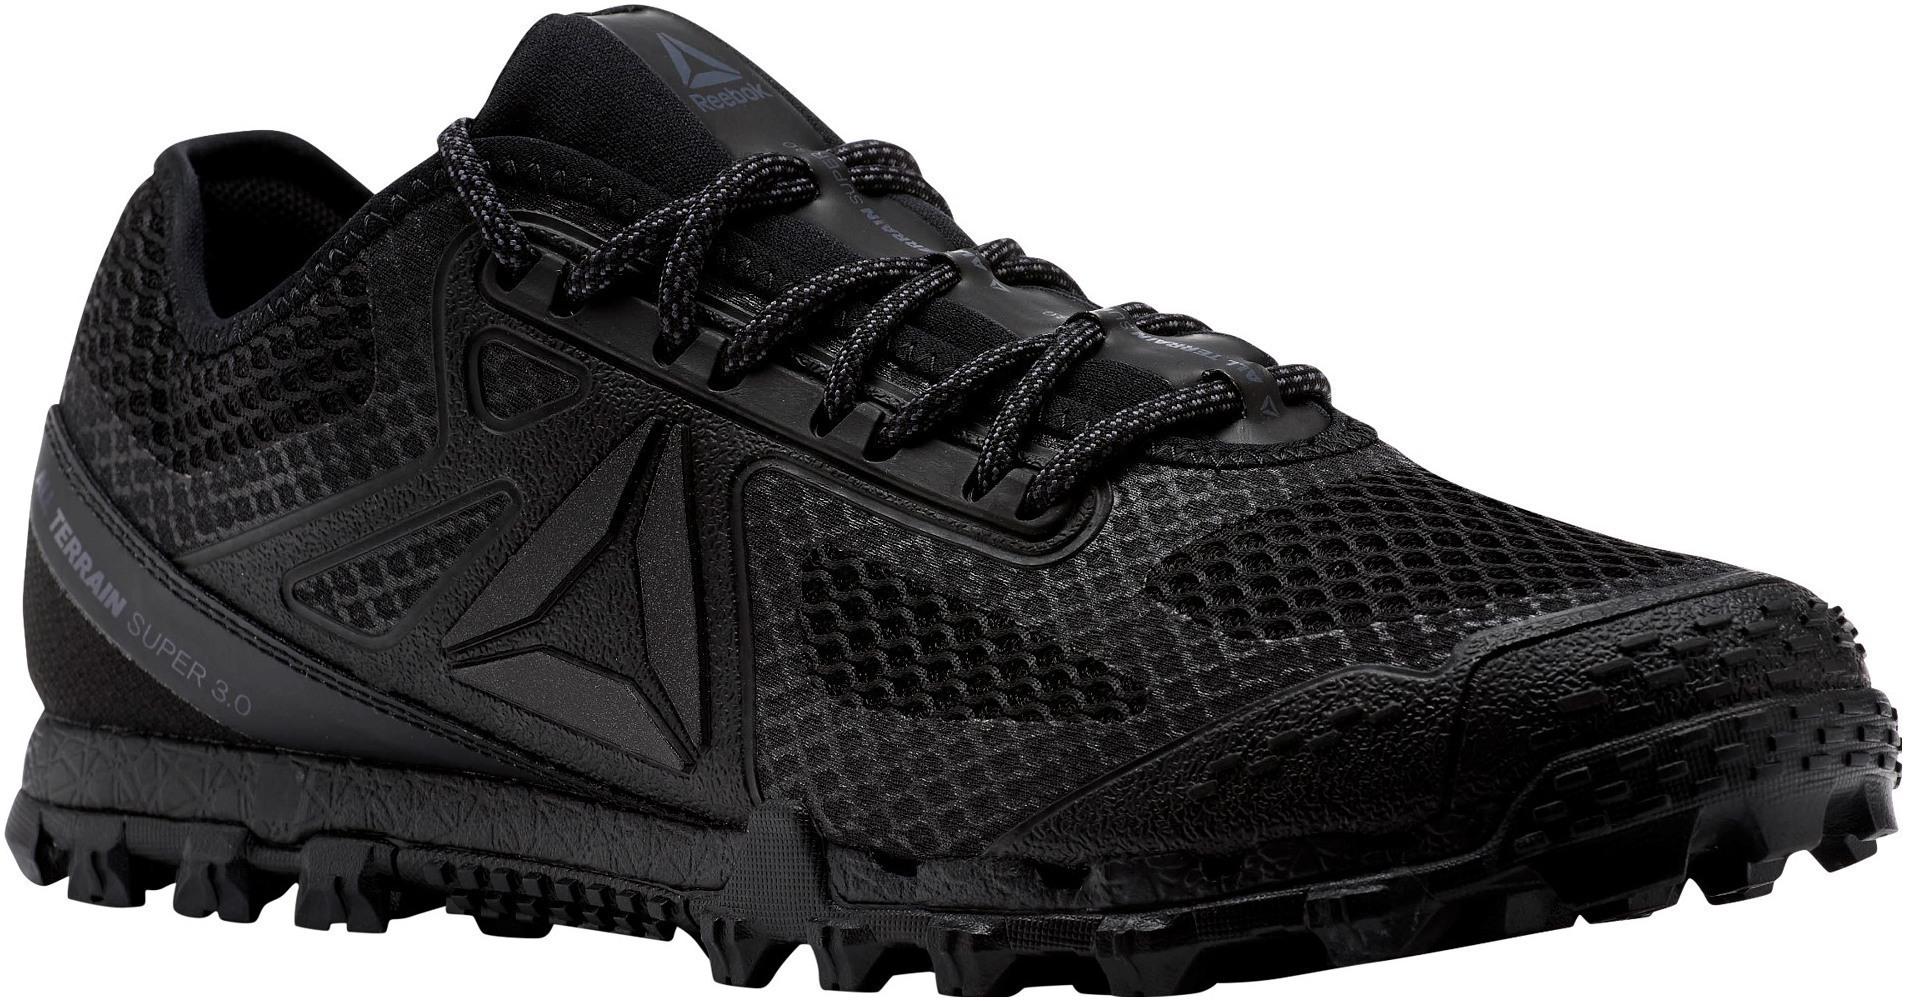 c51c1d8a42e7b Pánske bežecké topánky Reebok AT SUPER 3.0 STEALTH čierne | AD Sport.sk